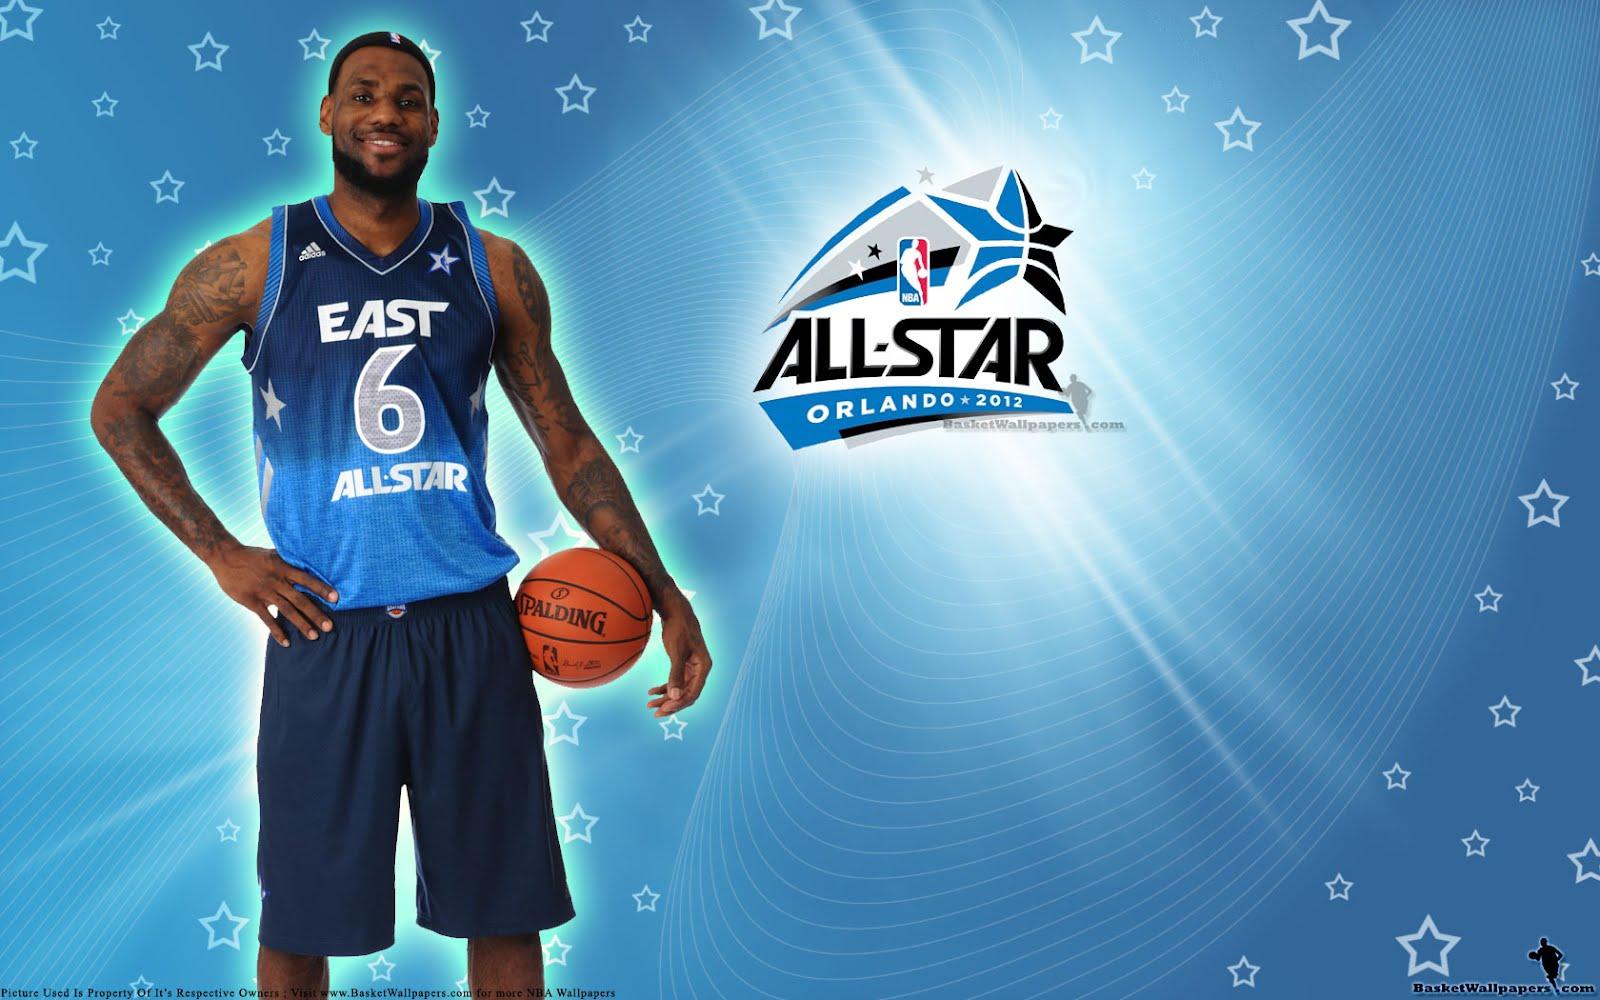 Sport Live EAST 2012 NBA All Star Wallpaper 1600x1000